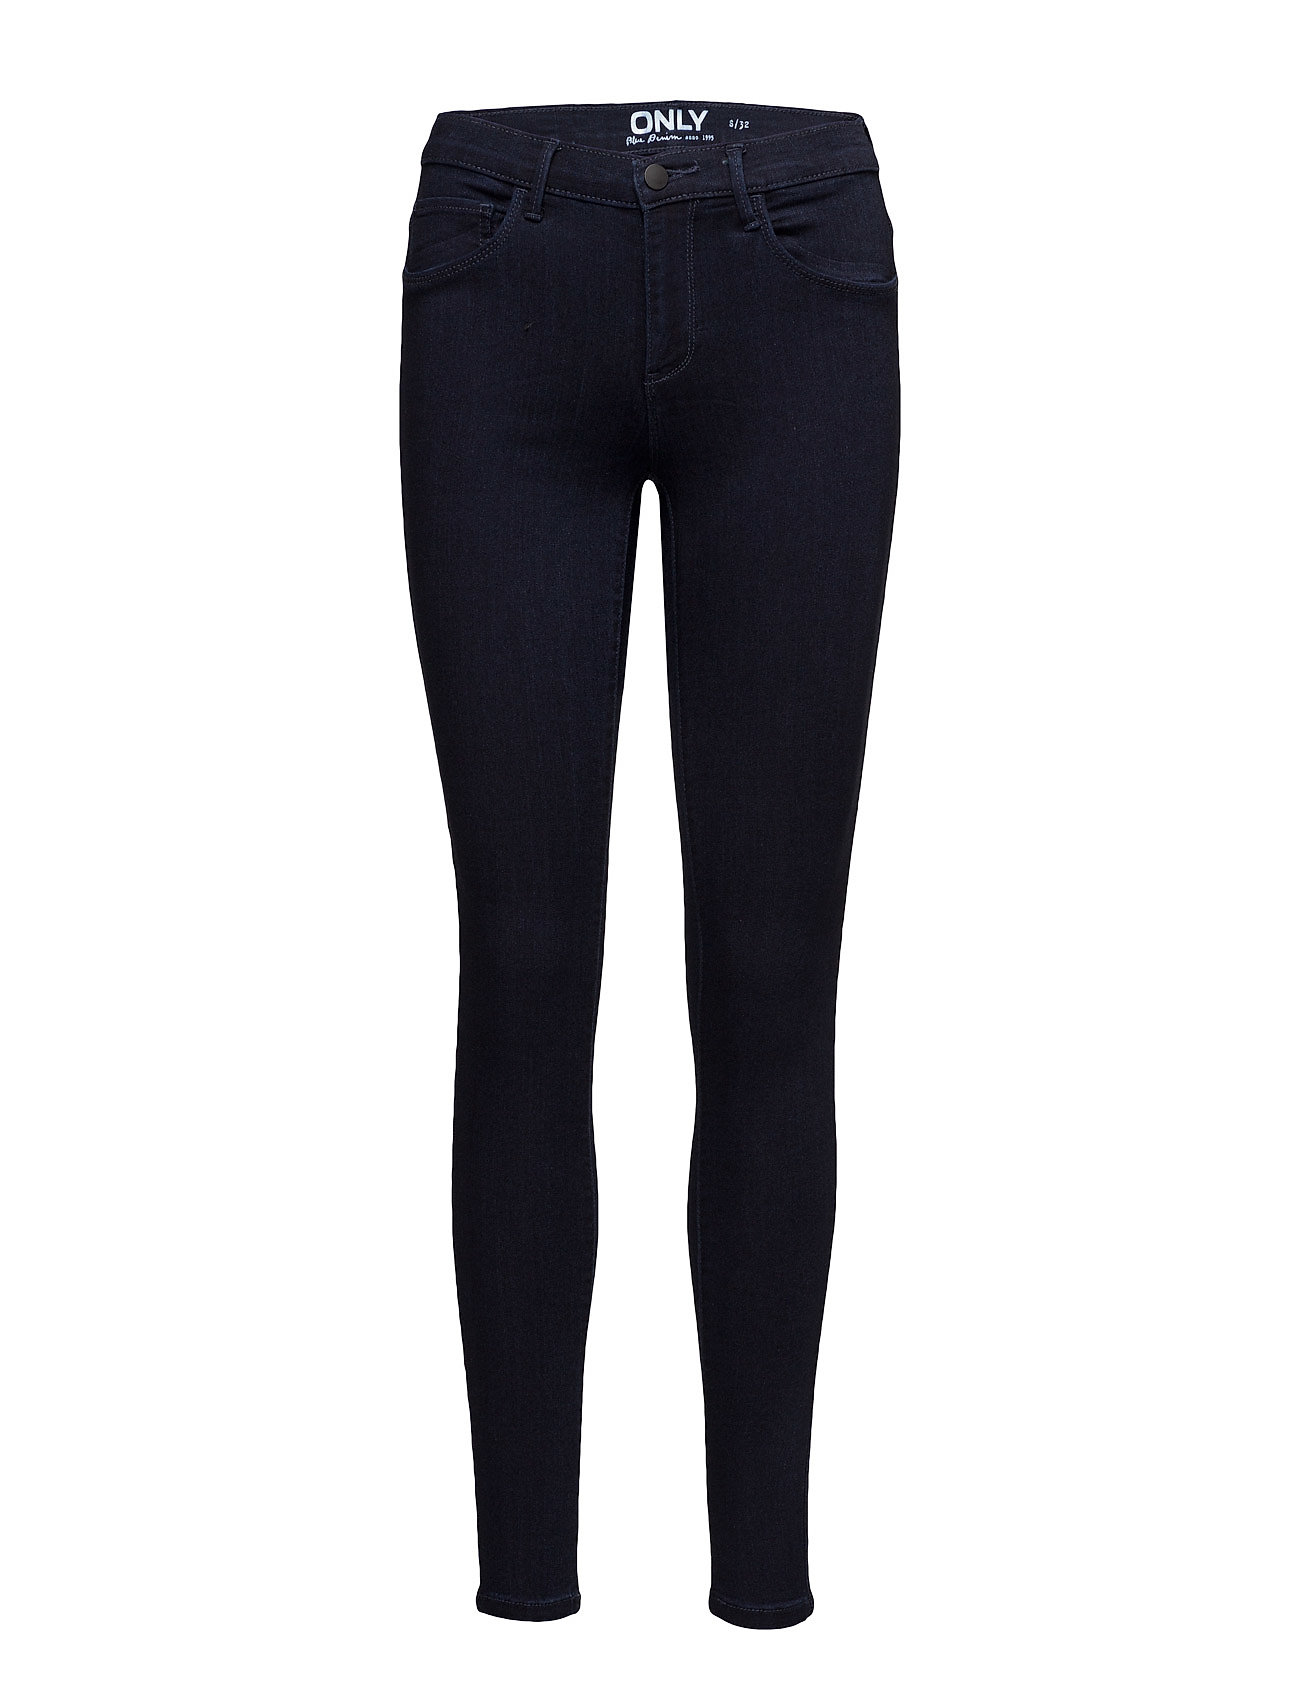 Skinny Jeans ONLRain blue denim Only T570dXvNXY